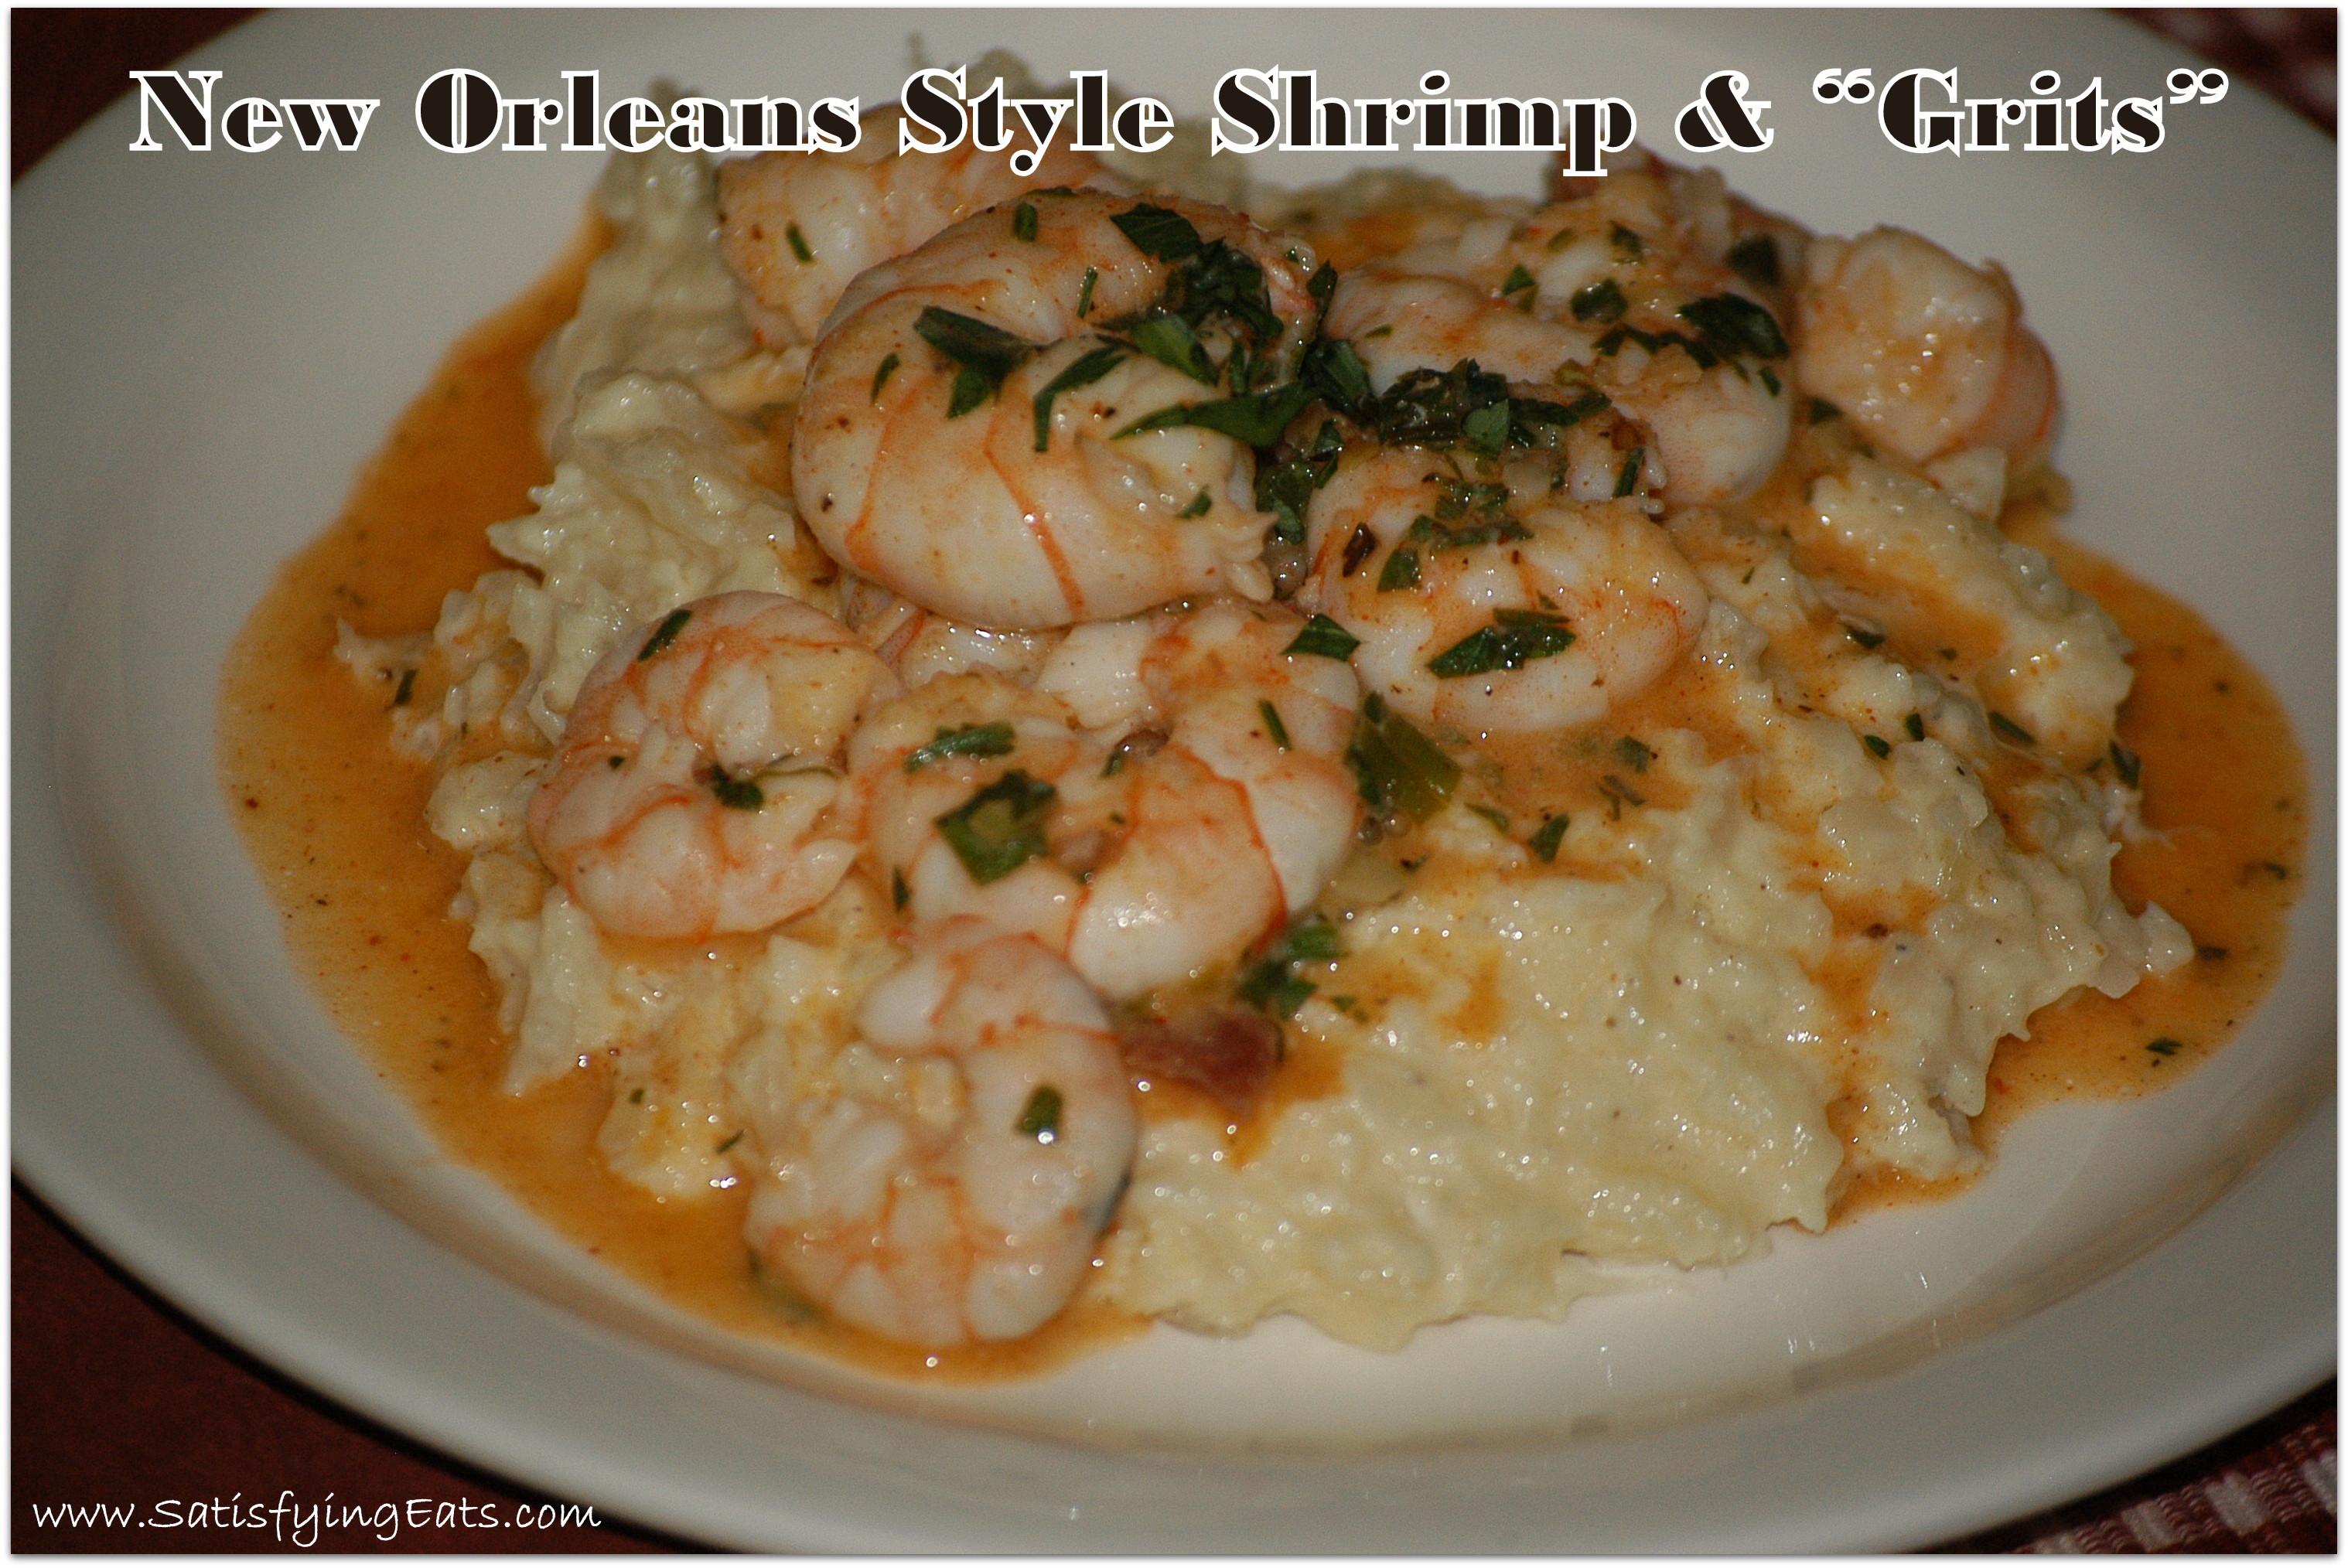 Shrimp & Sausage Creole (Stew)